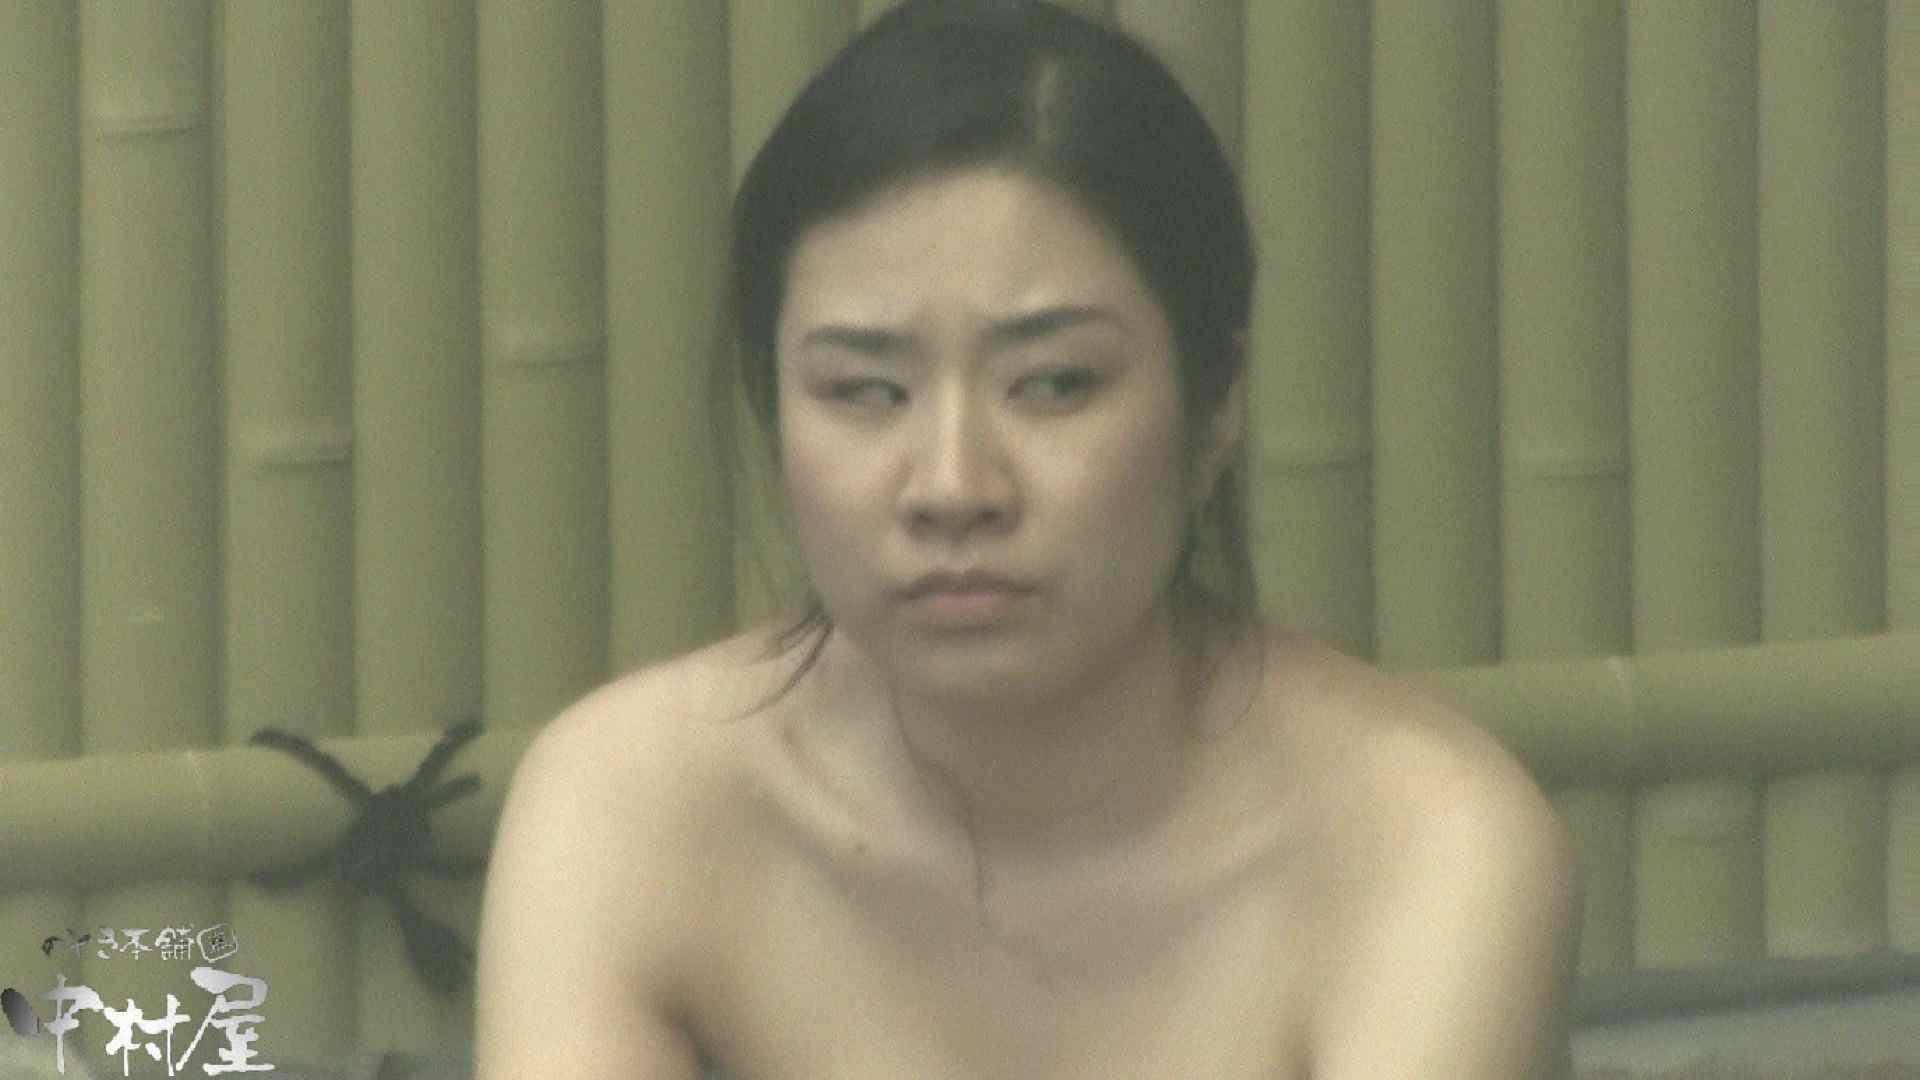 Aquaな露天風呂Vol.913 盗撮大放出 ヌード画像 65連発 23